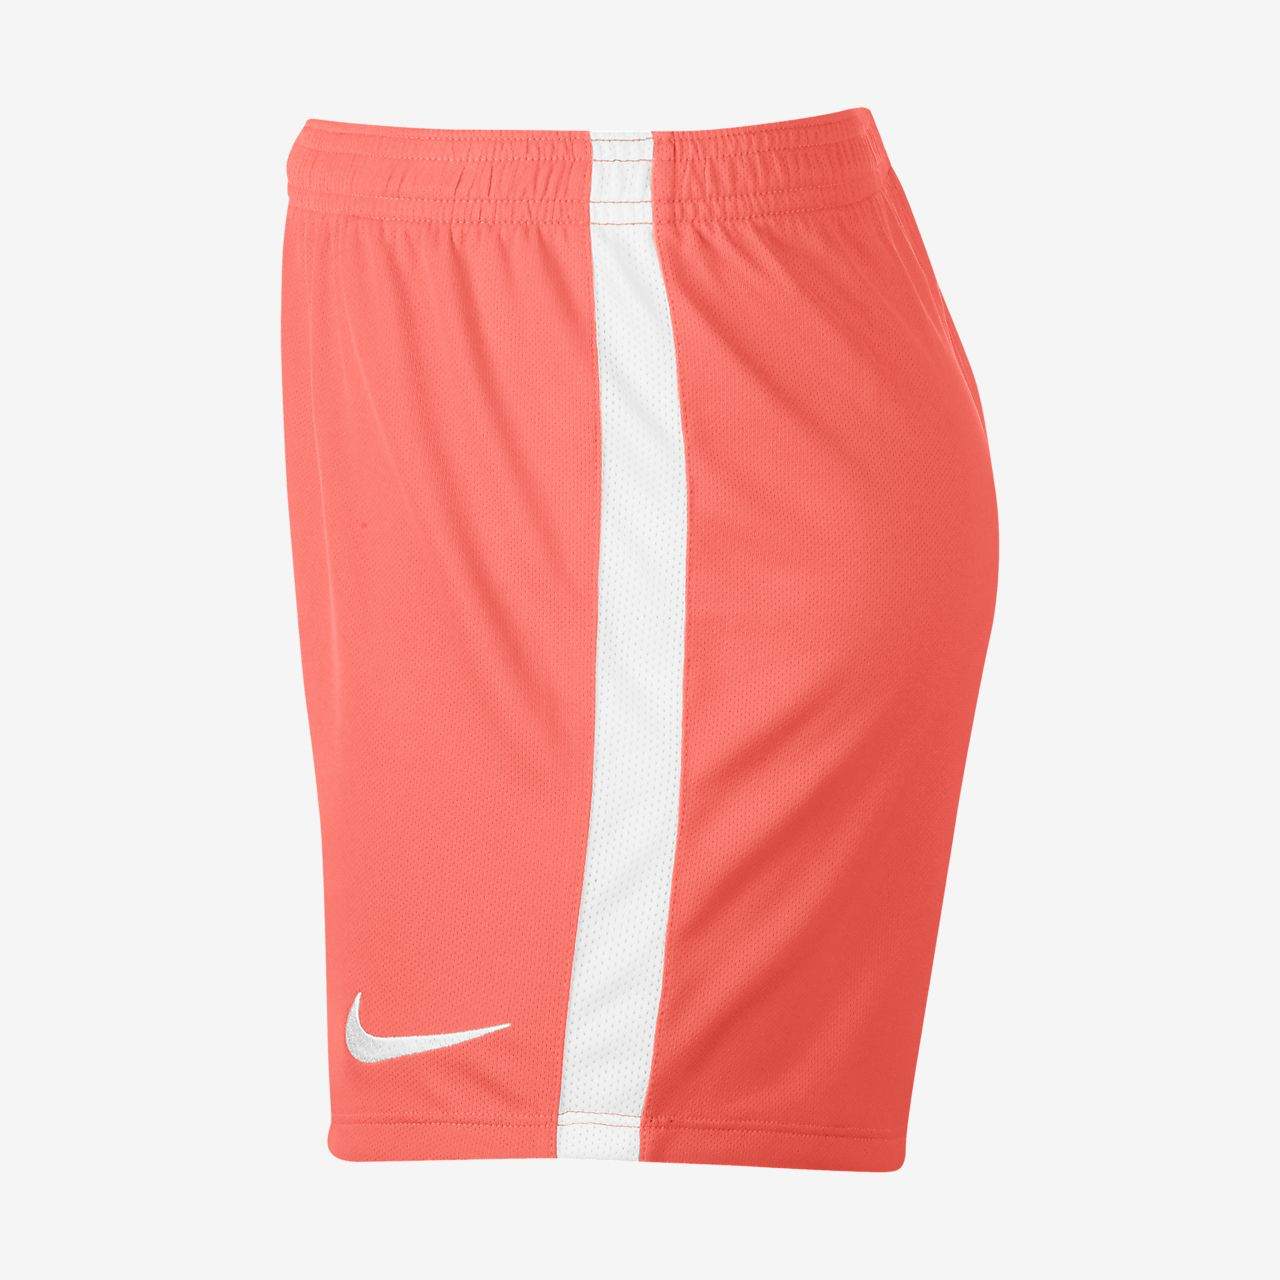 nike drifit academy womens soccer shorts nikecom